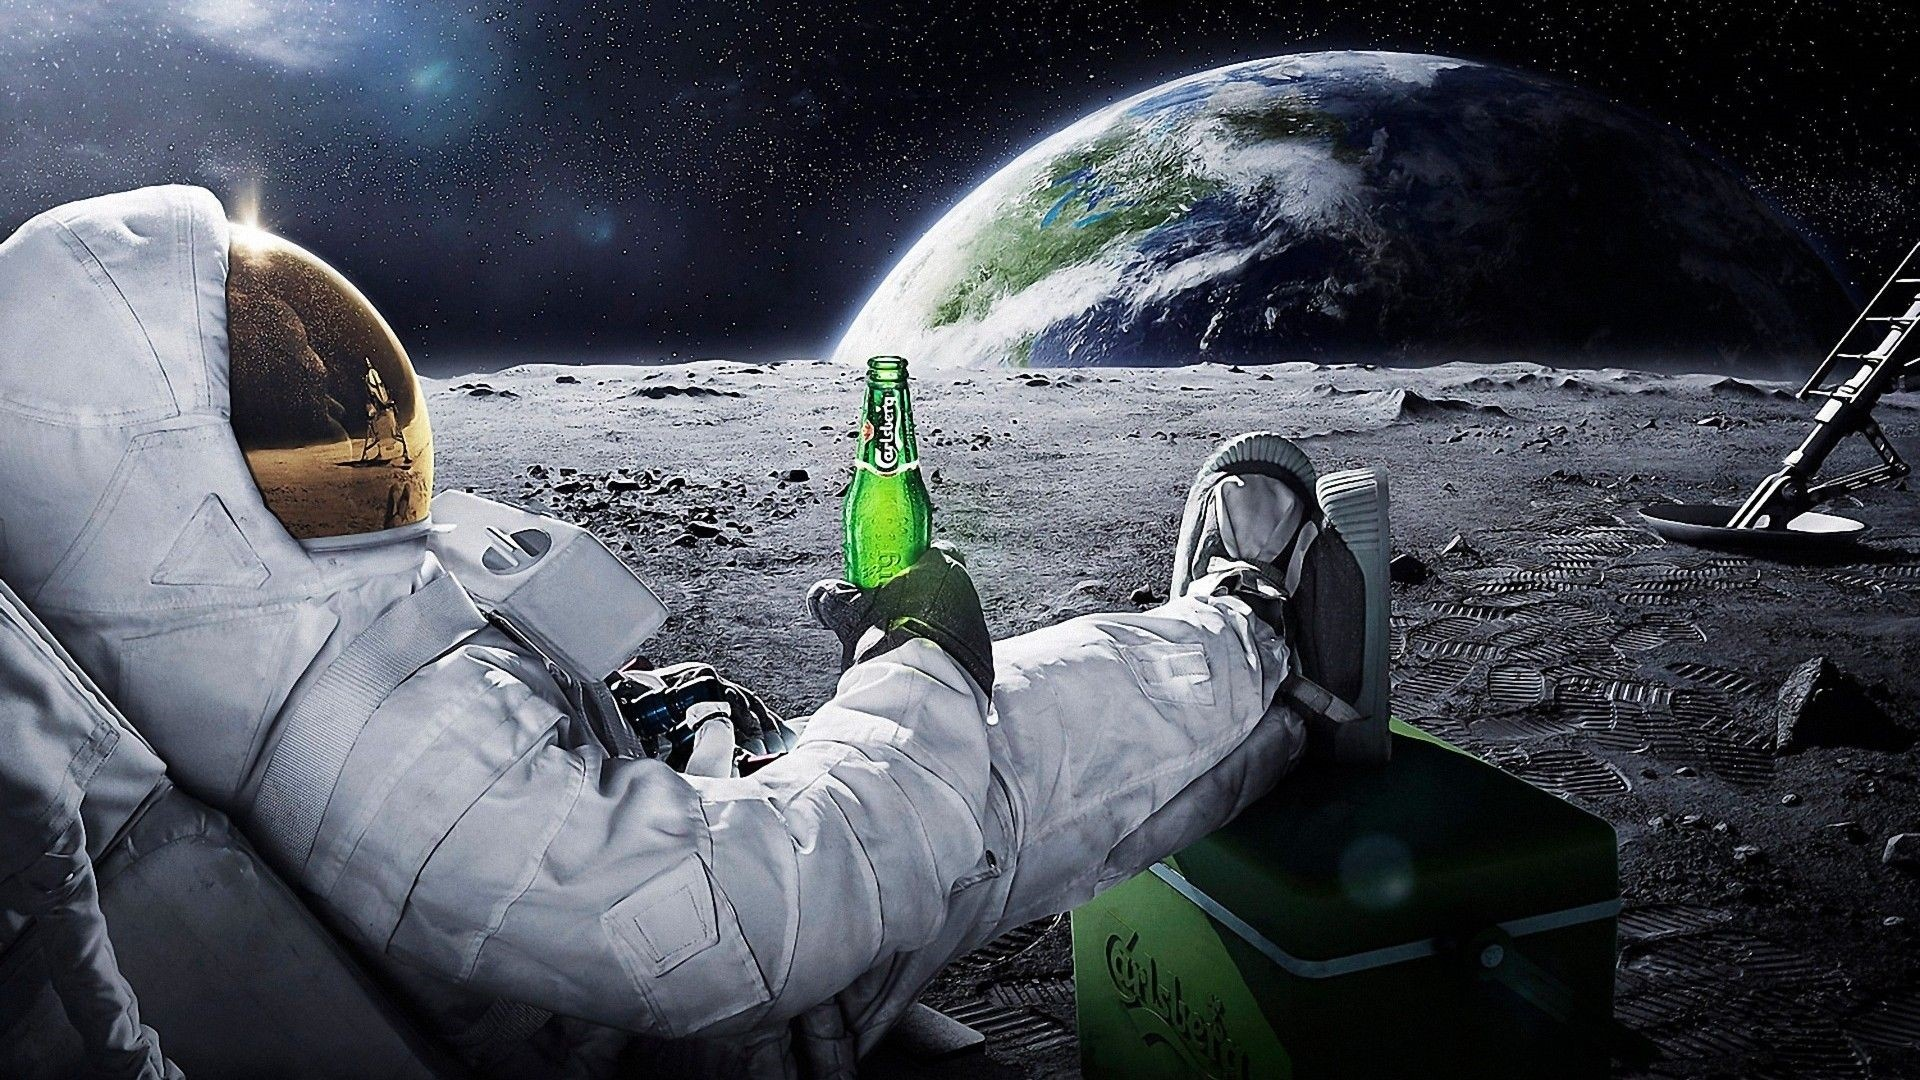 Astronaut Picture